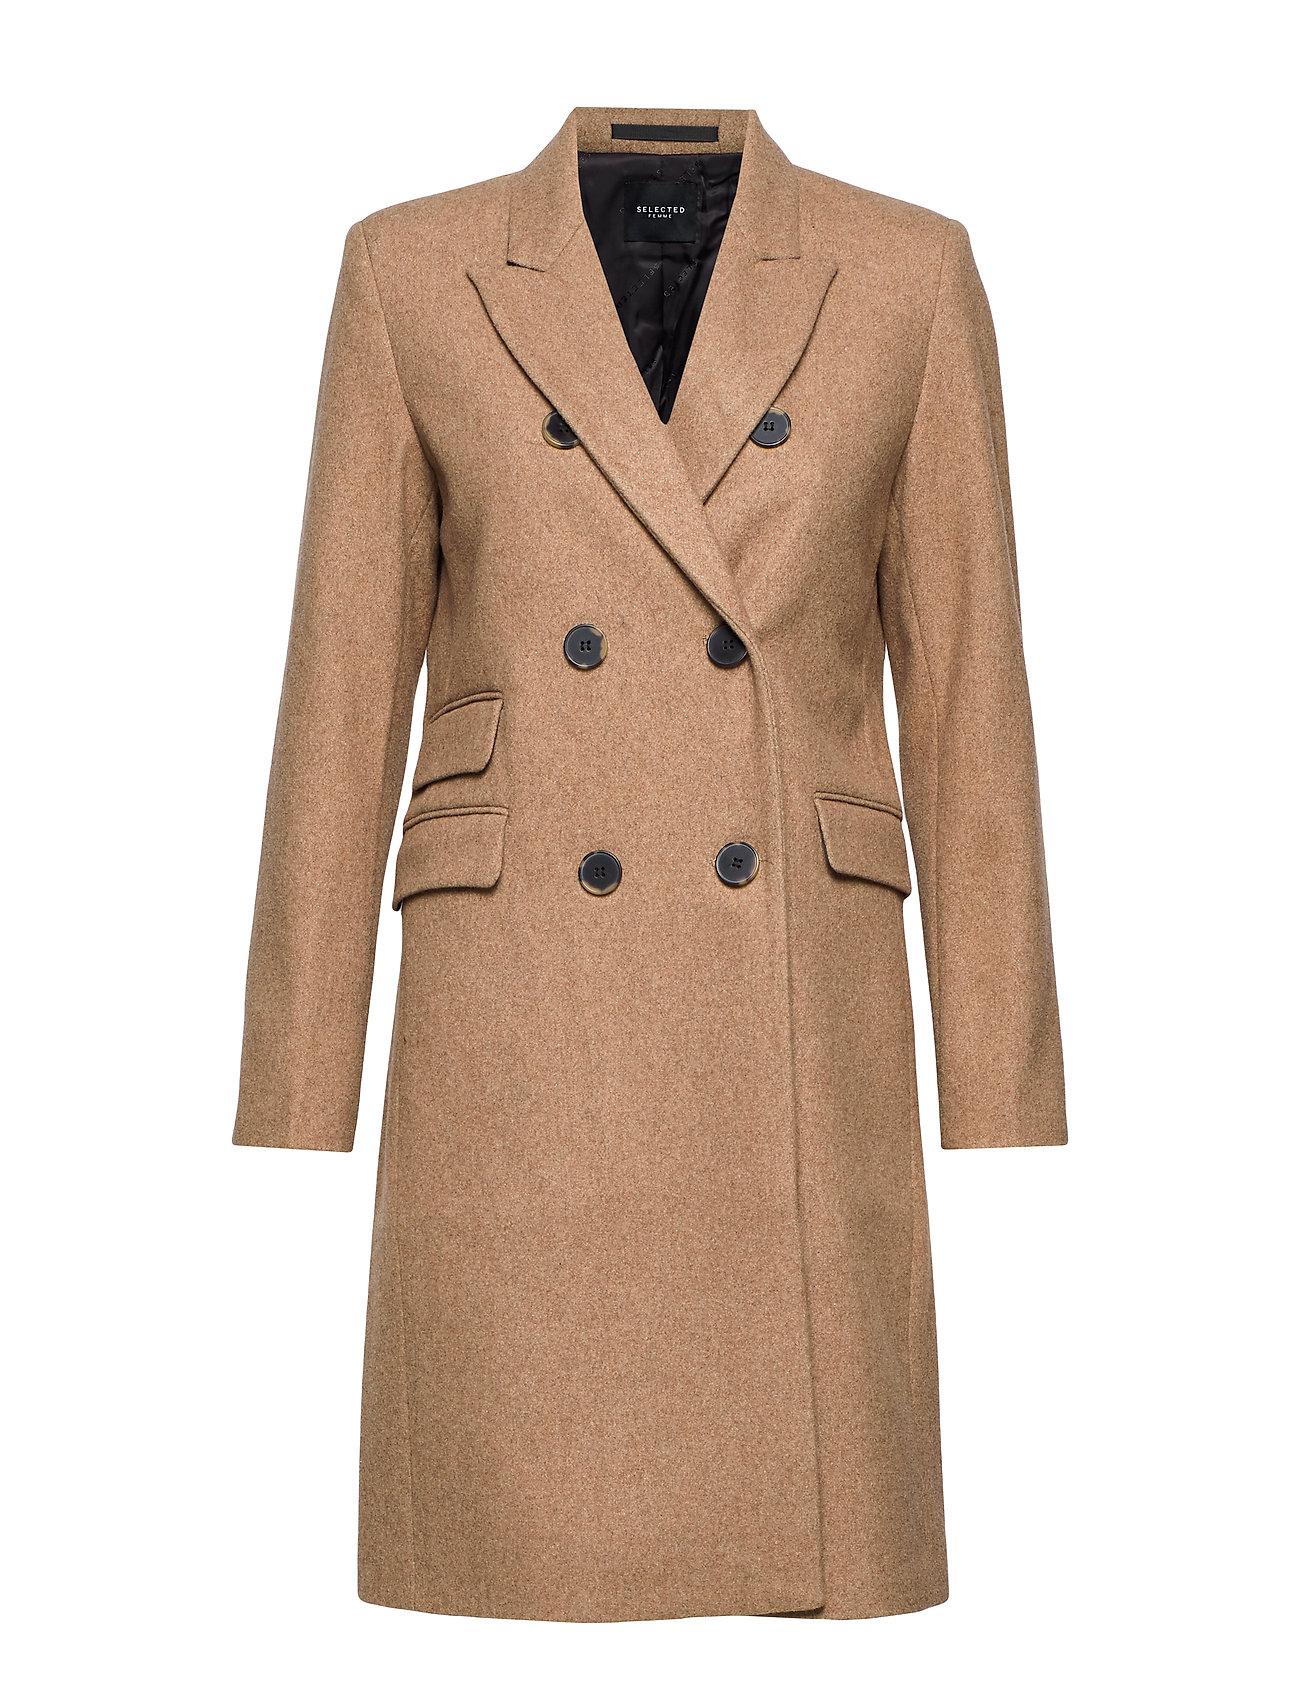 Selected Femme SLFBINA WOOL COAT B CAMP - AMPHORA